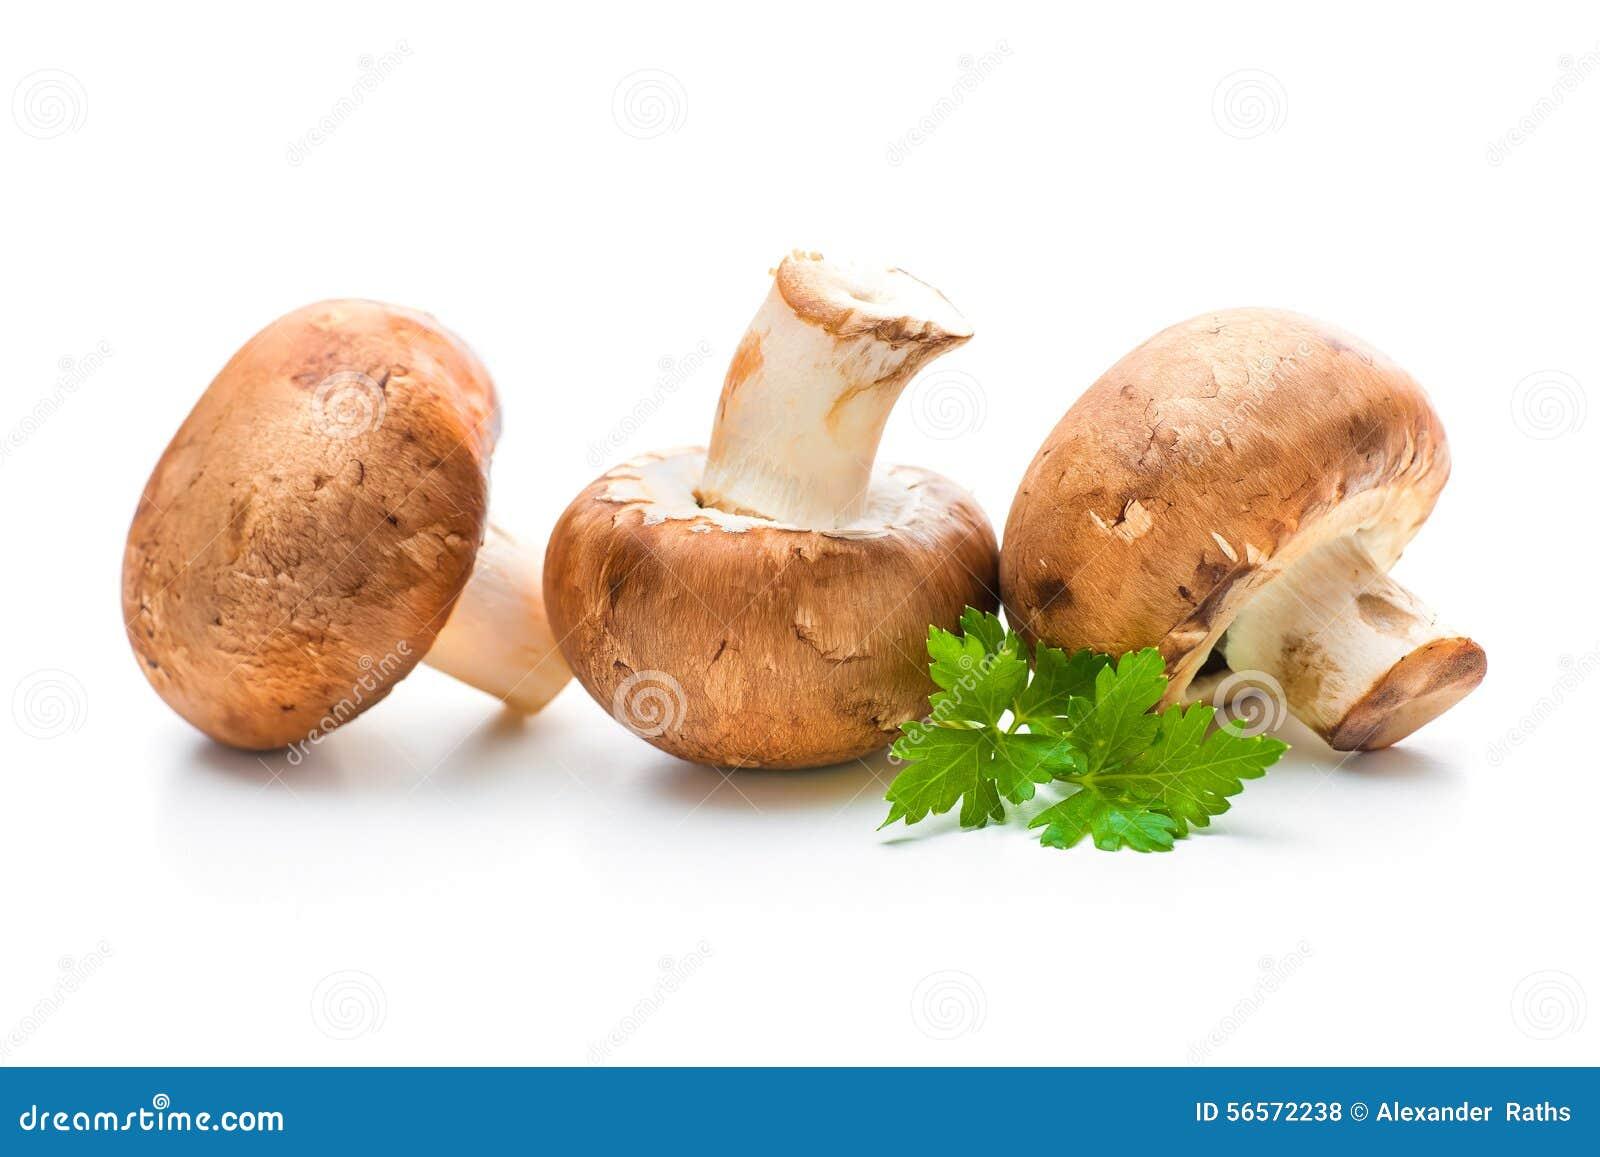 Download Champignon φρέσκα μανιτάρια Στοκ Εικόνες - εικόνα από διατροφή, μανιτάρια: 56572238